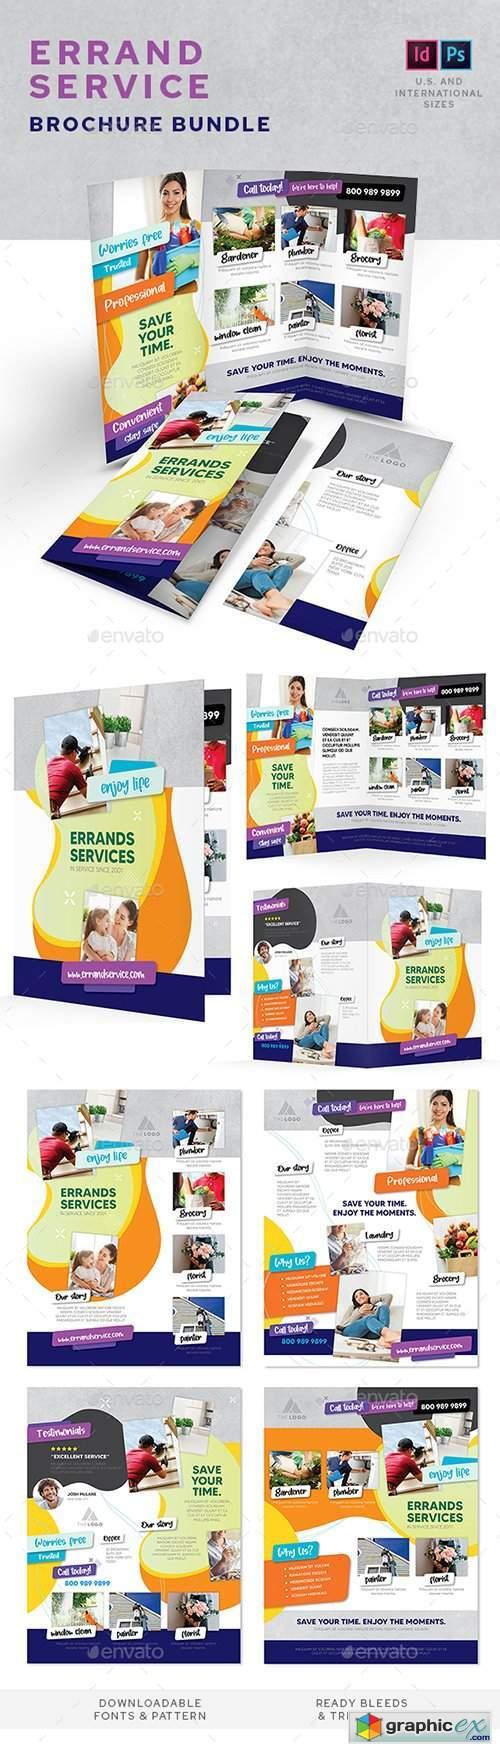 Errand Service Print Bundle